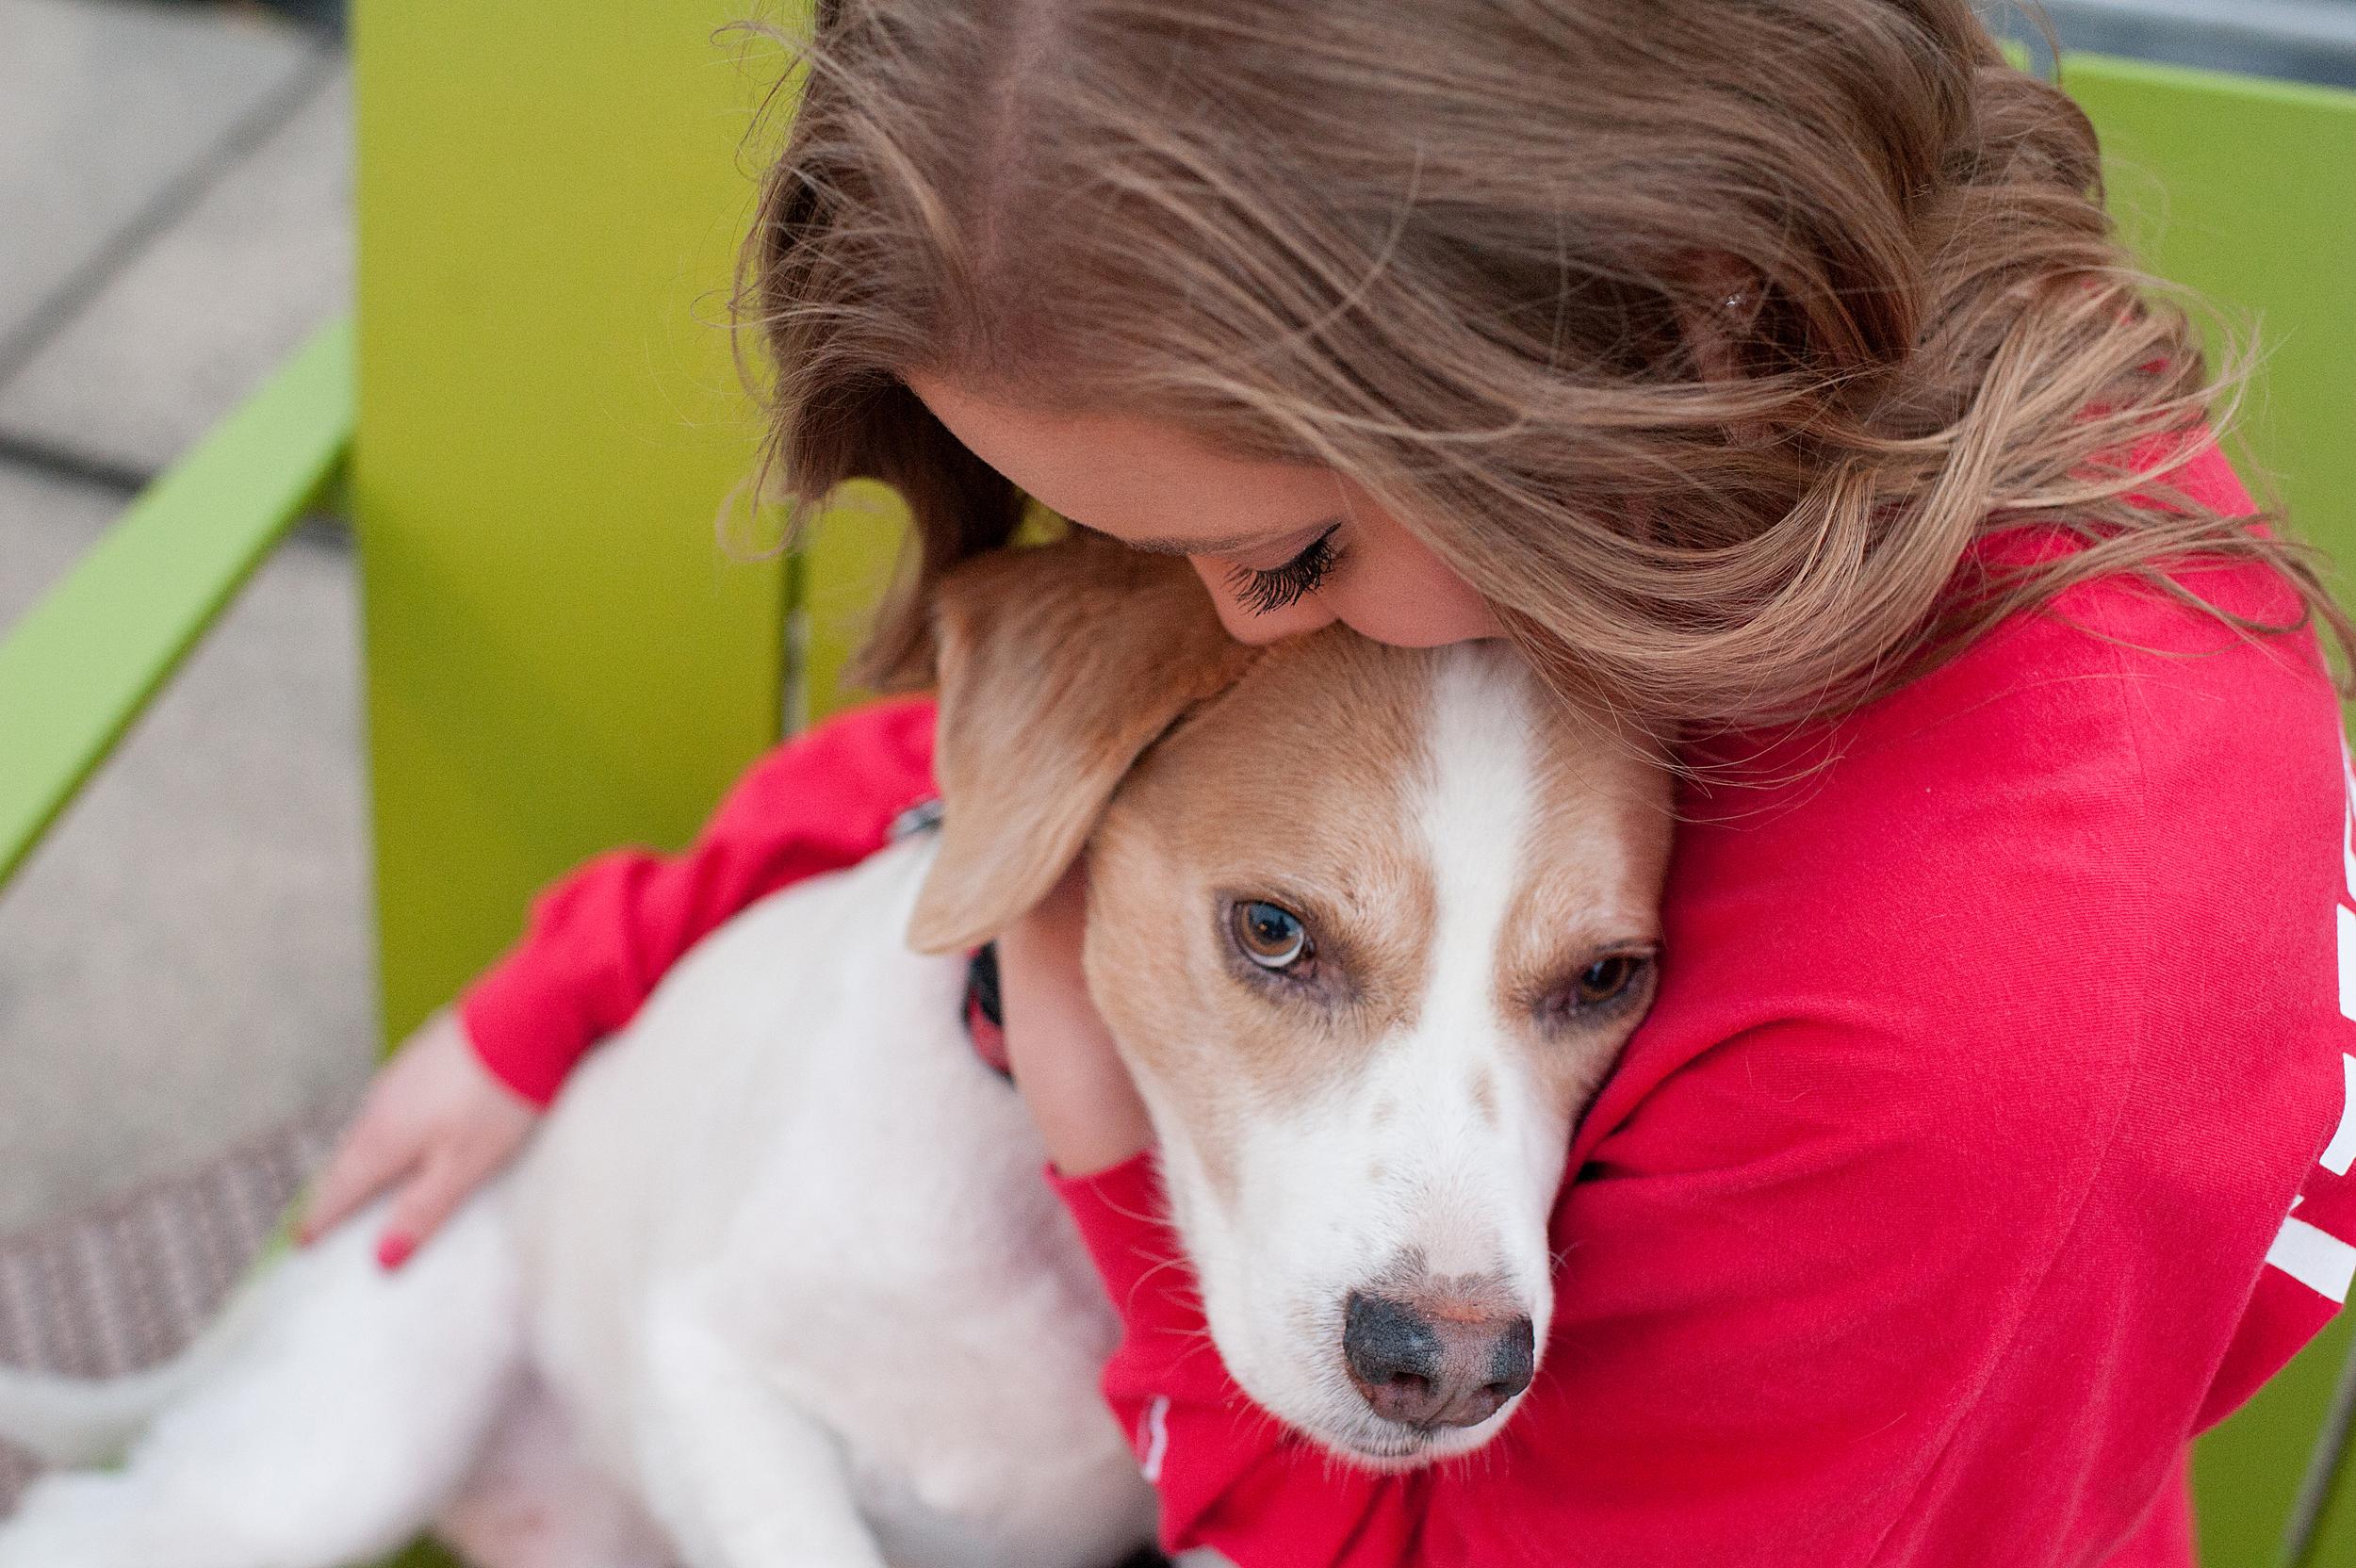 pittsburgh-north-shore-dog-photography-jenny-karlsson-030.jpg